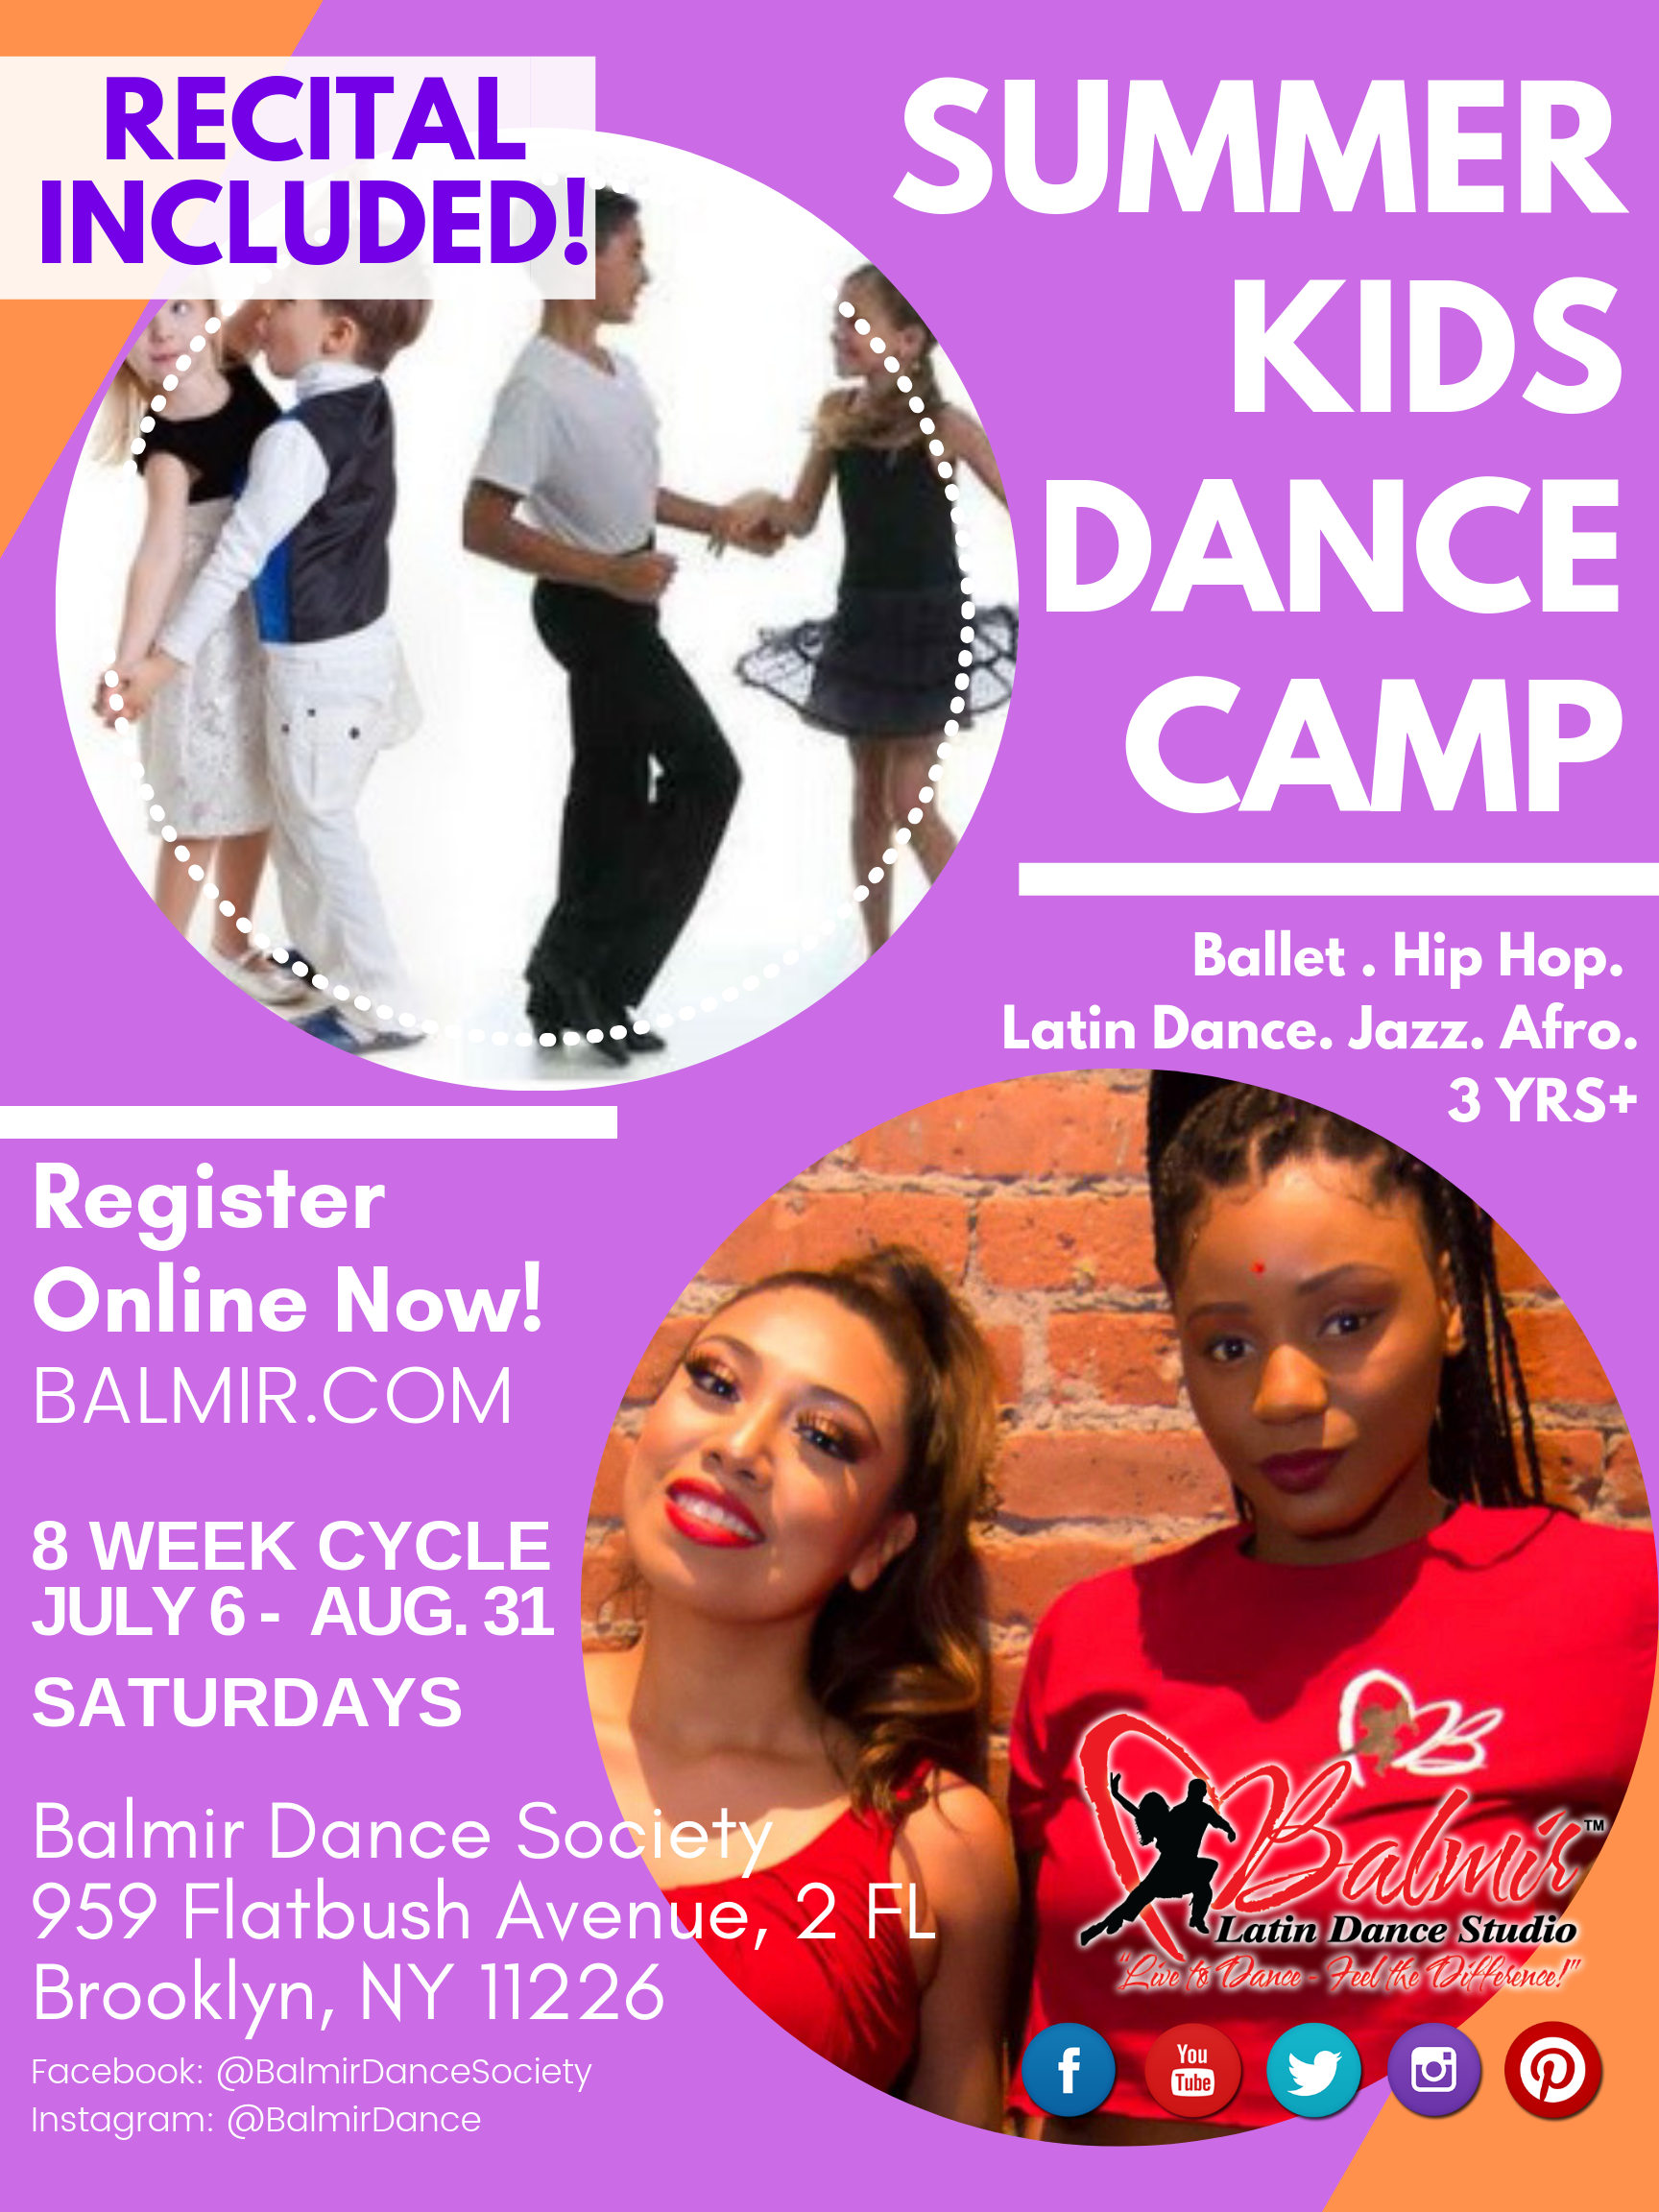 Kids Dance Classes Ballet Hip Hop Latin in Brooklyn NYC Summer 2019 SALSA BACHATA CHACHACHA.png